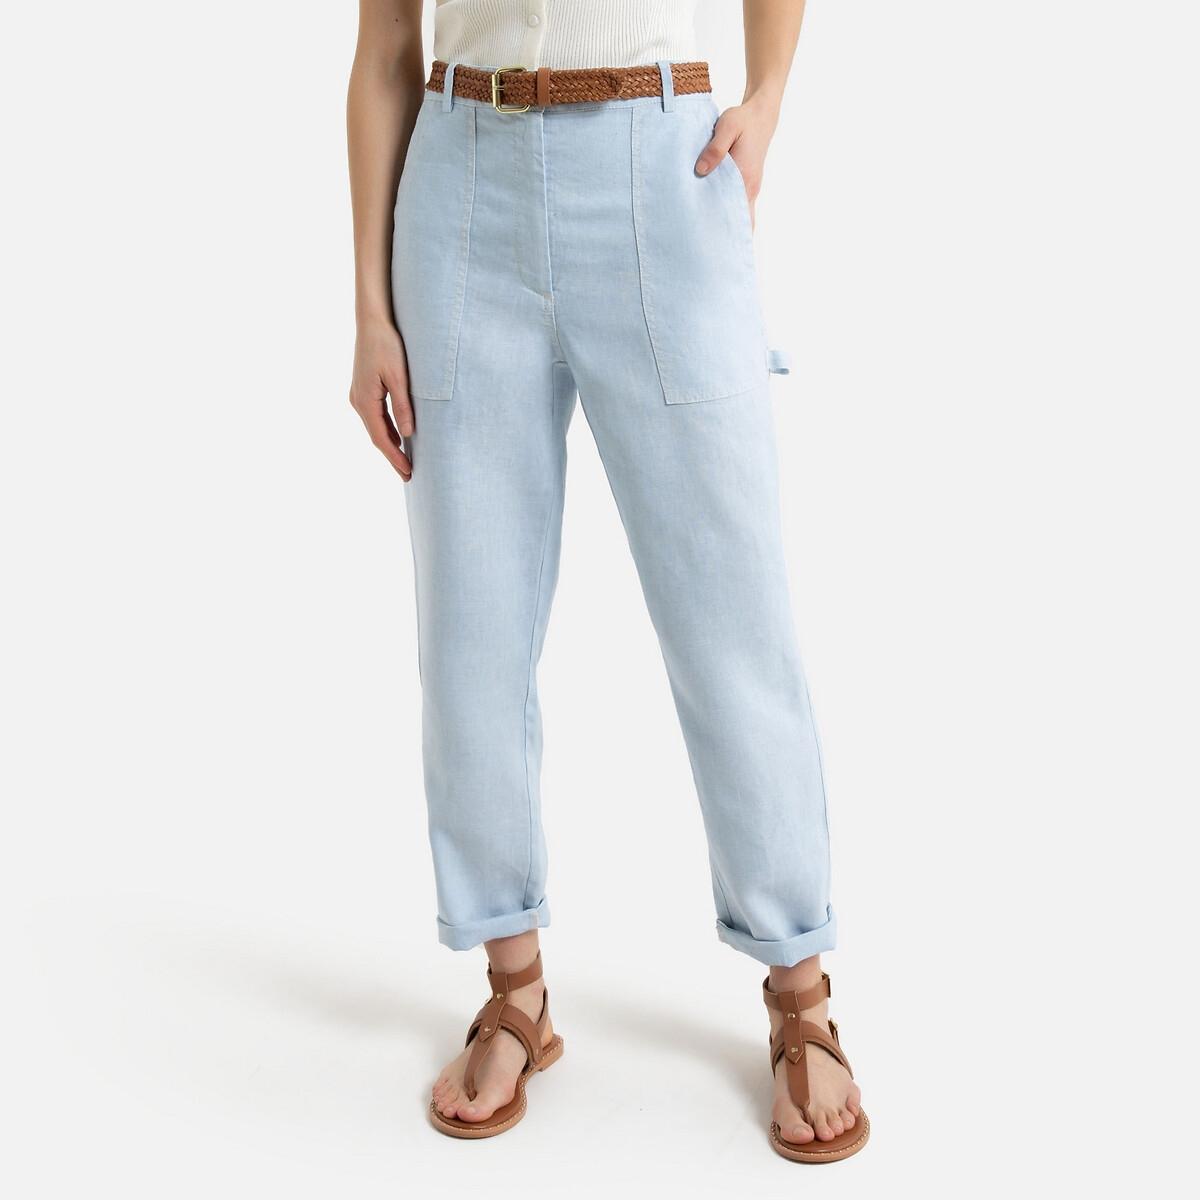 Pantalon droit style charpentier en lin